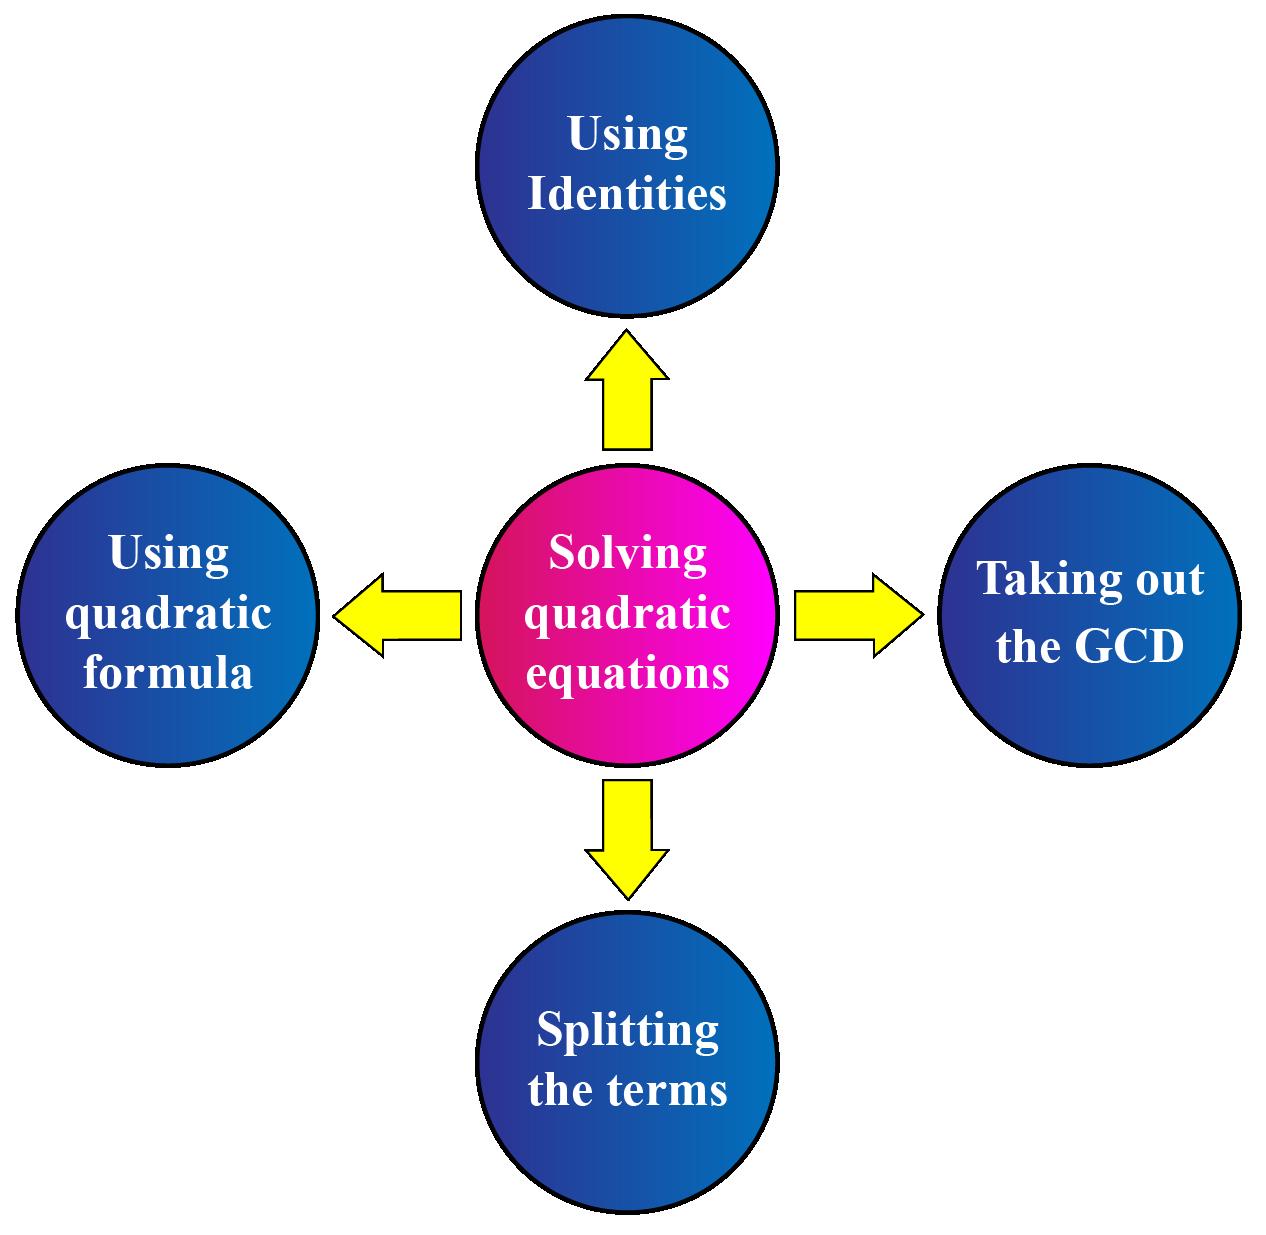 Ways to factorize the quadratic equaion